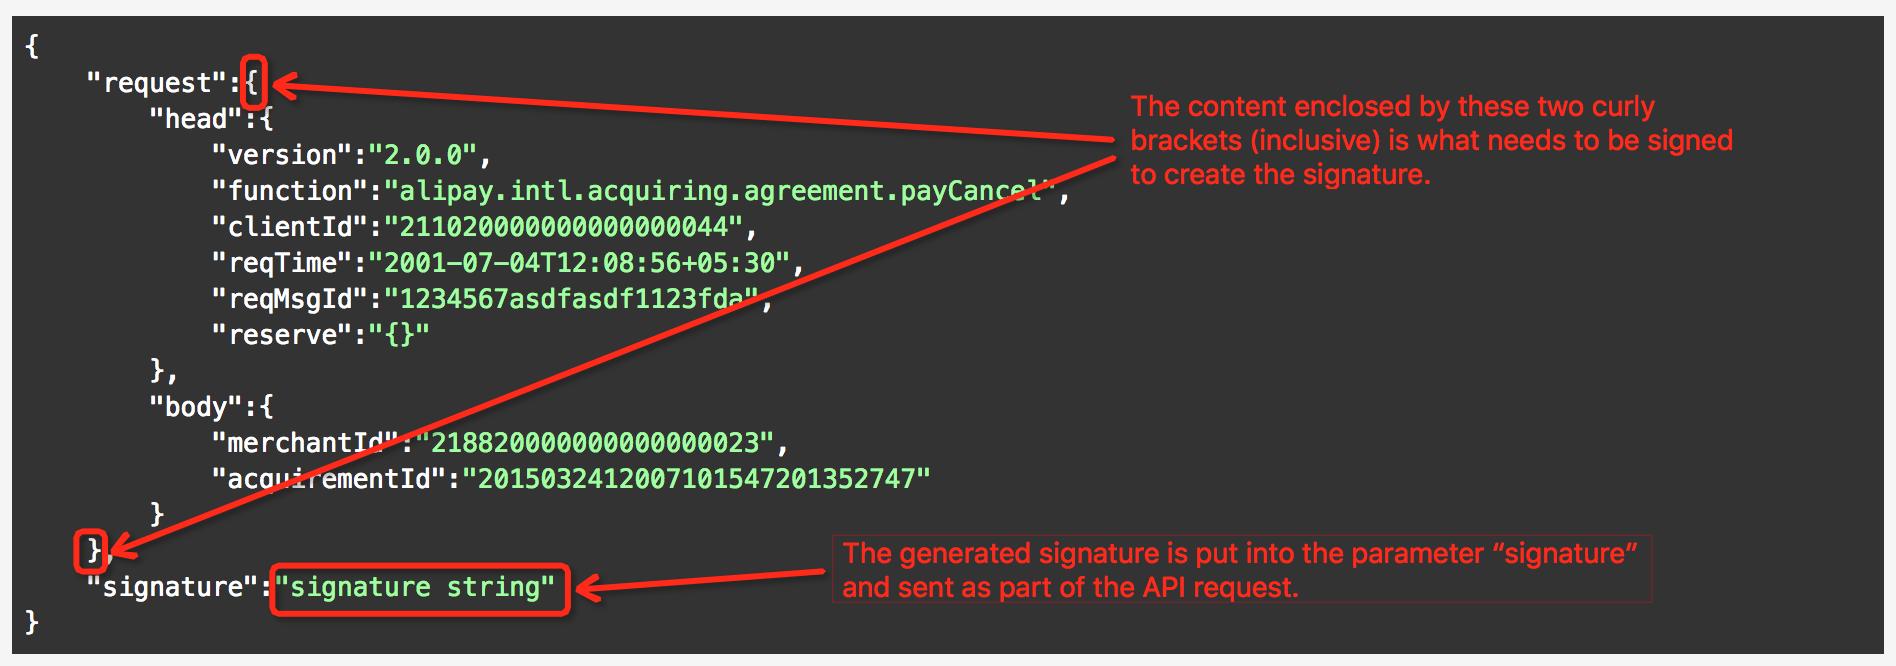 Alipay Documentation Digital Signature